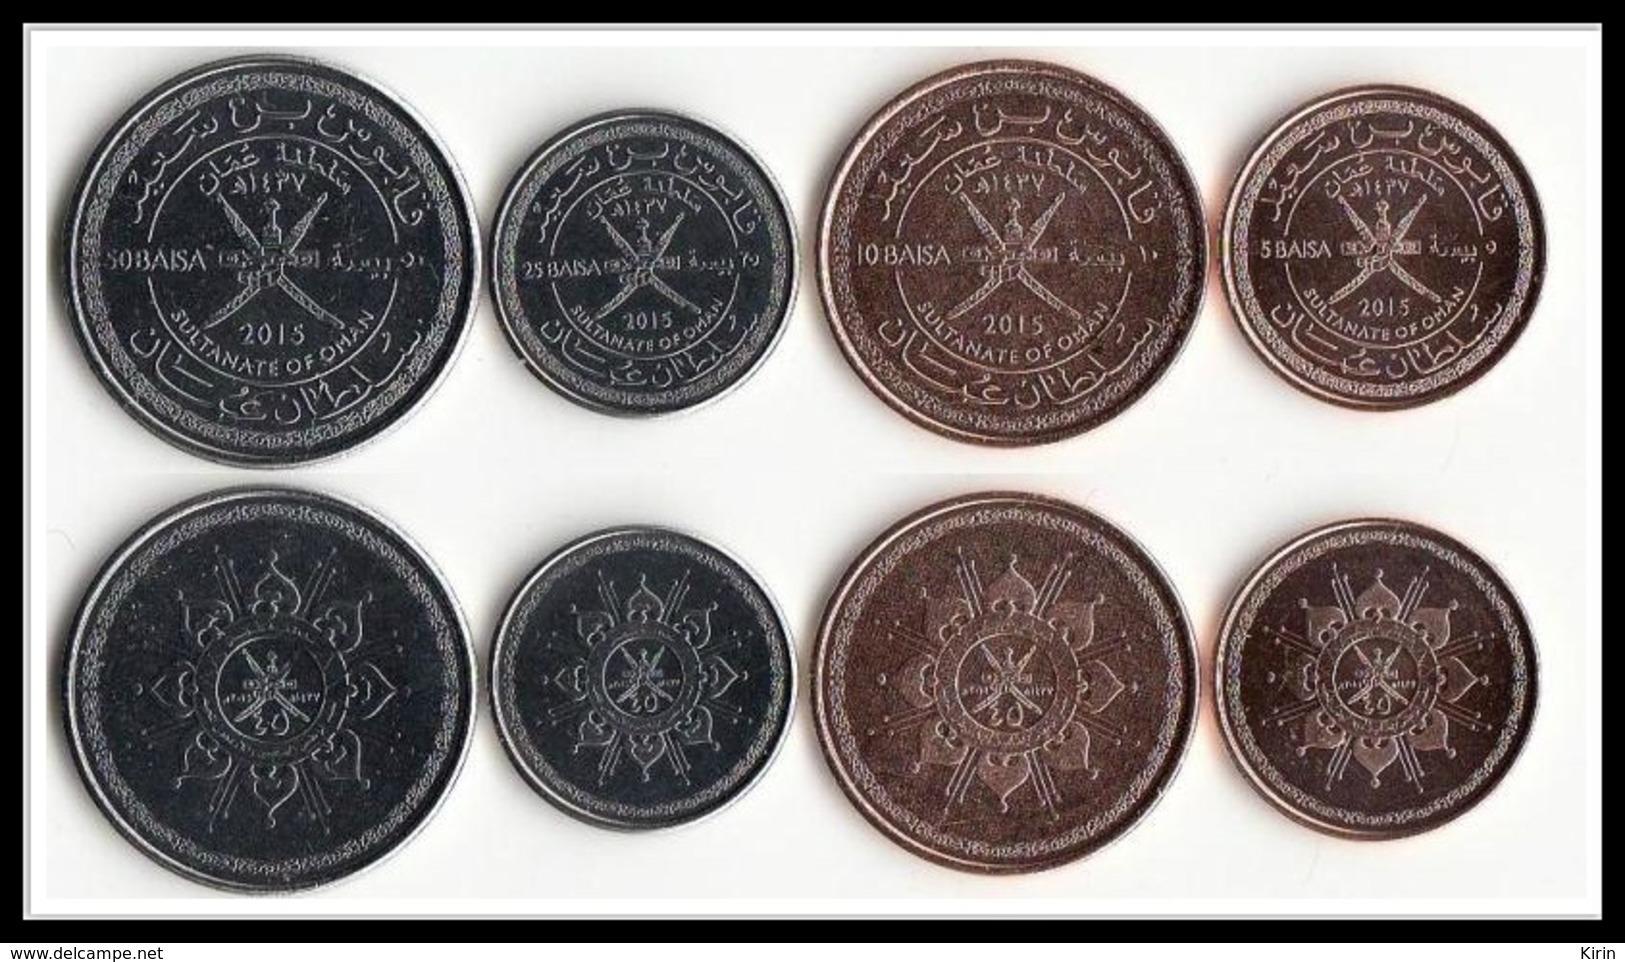 OMAN 4 COINS SET. 2015 Commemorative Coin UNC - Oman